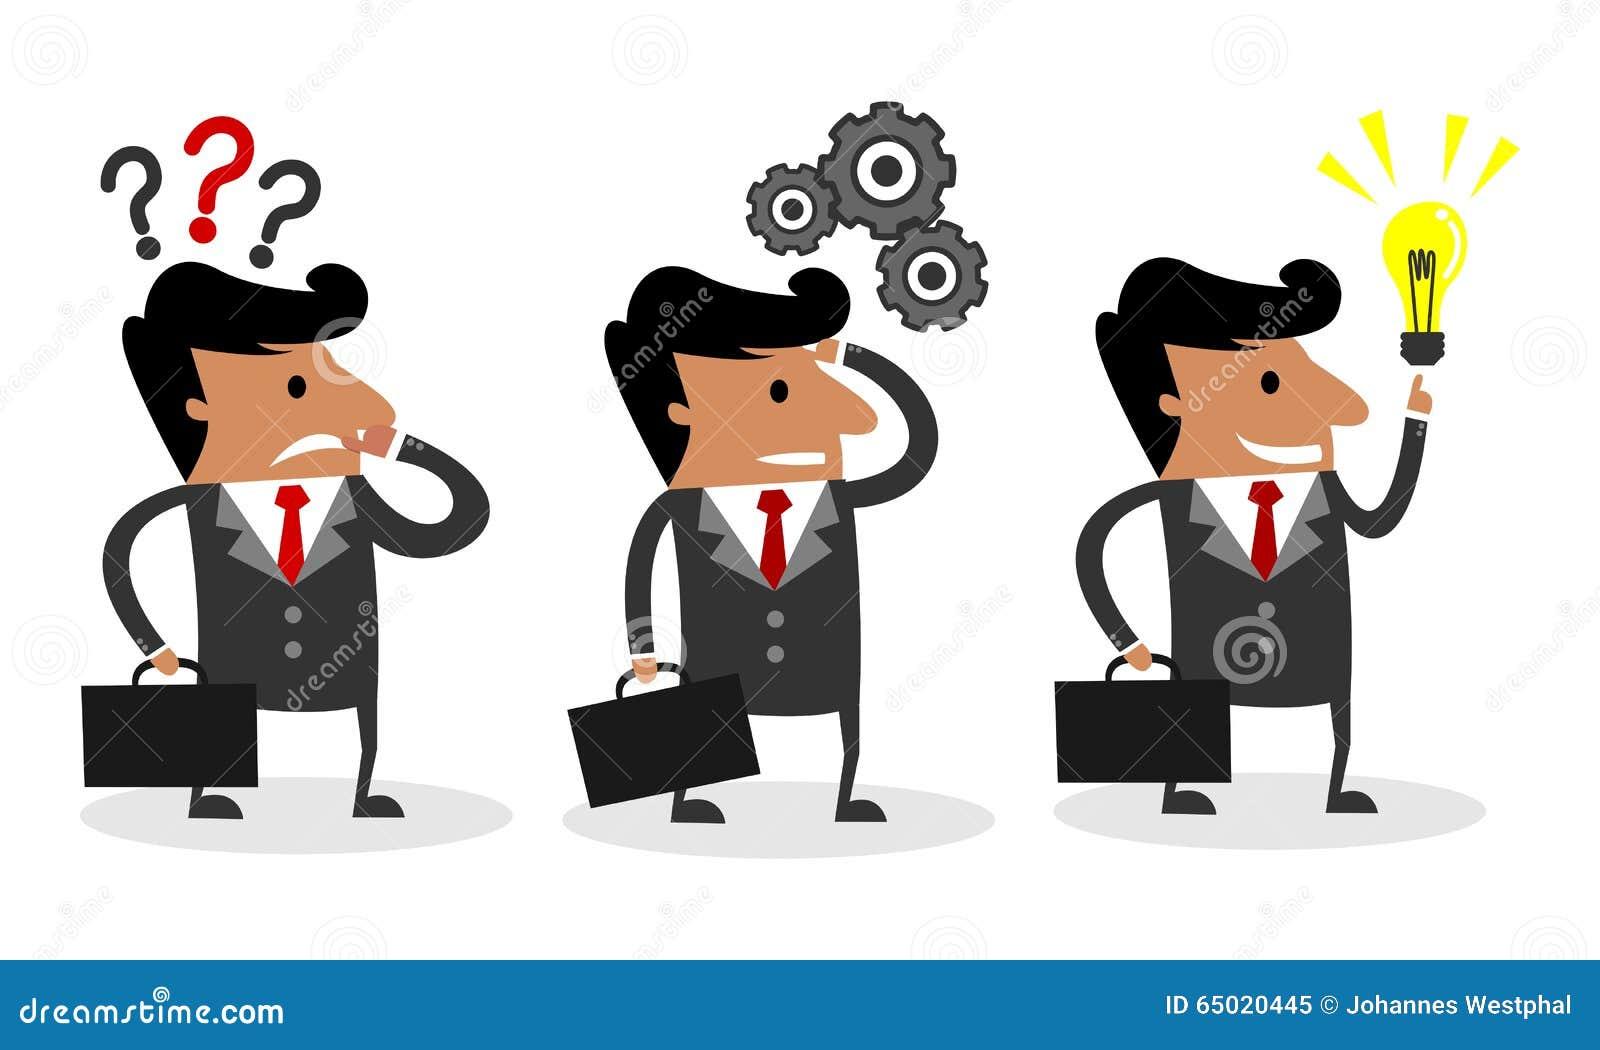 business-man-solving-problem-three-phase